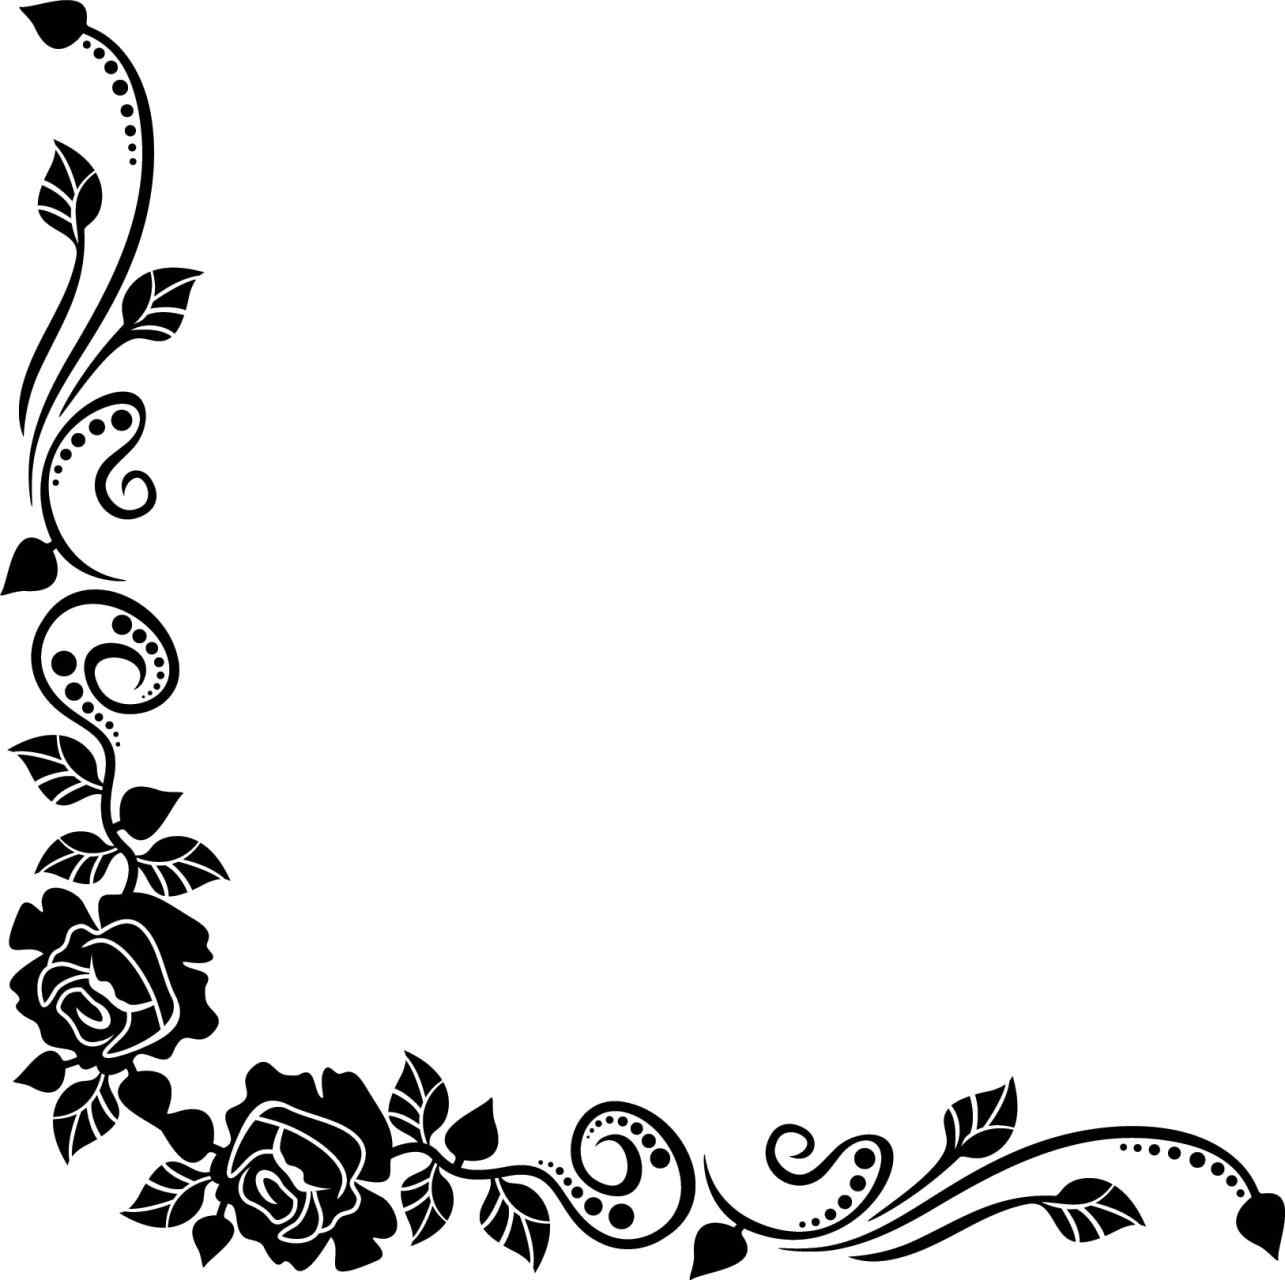 1285x1280 Free Flower Rose Corner Border Black And White Bouquet Clipart